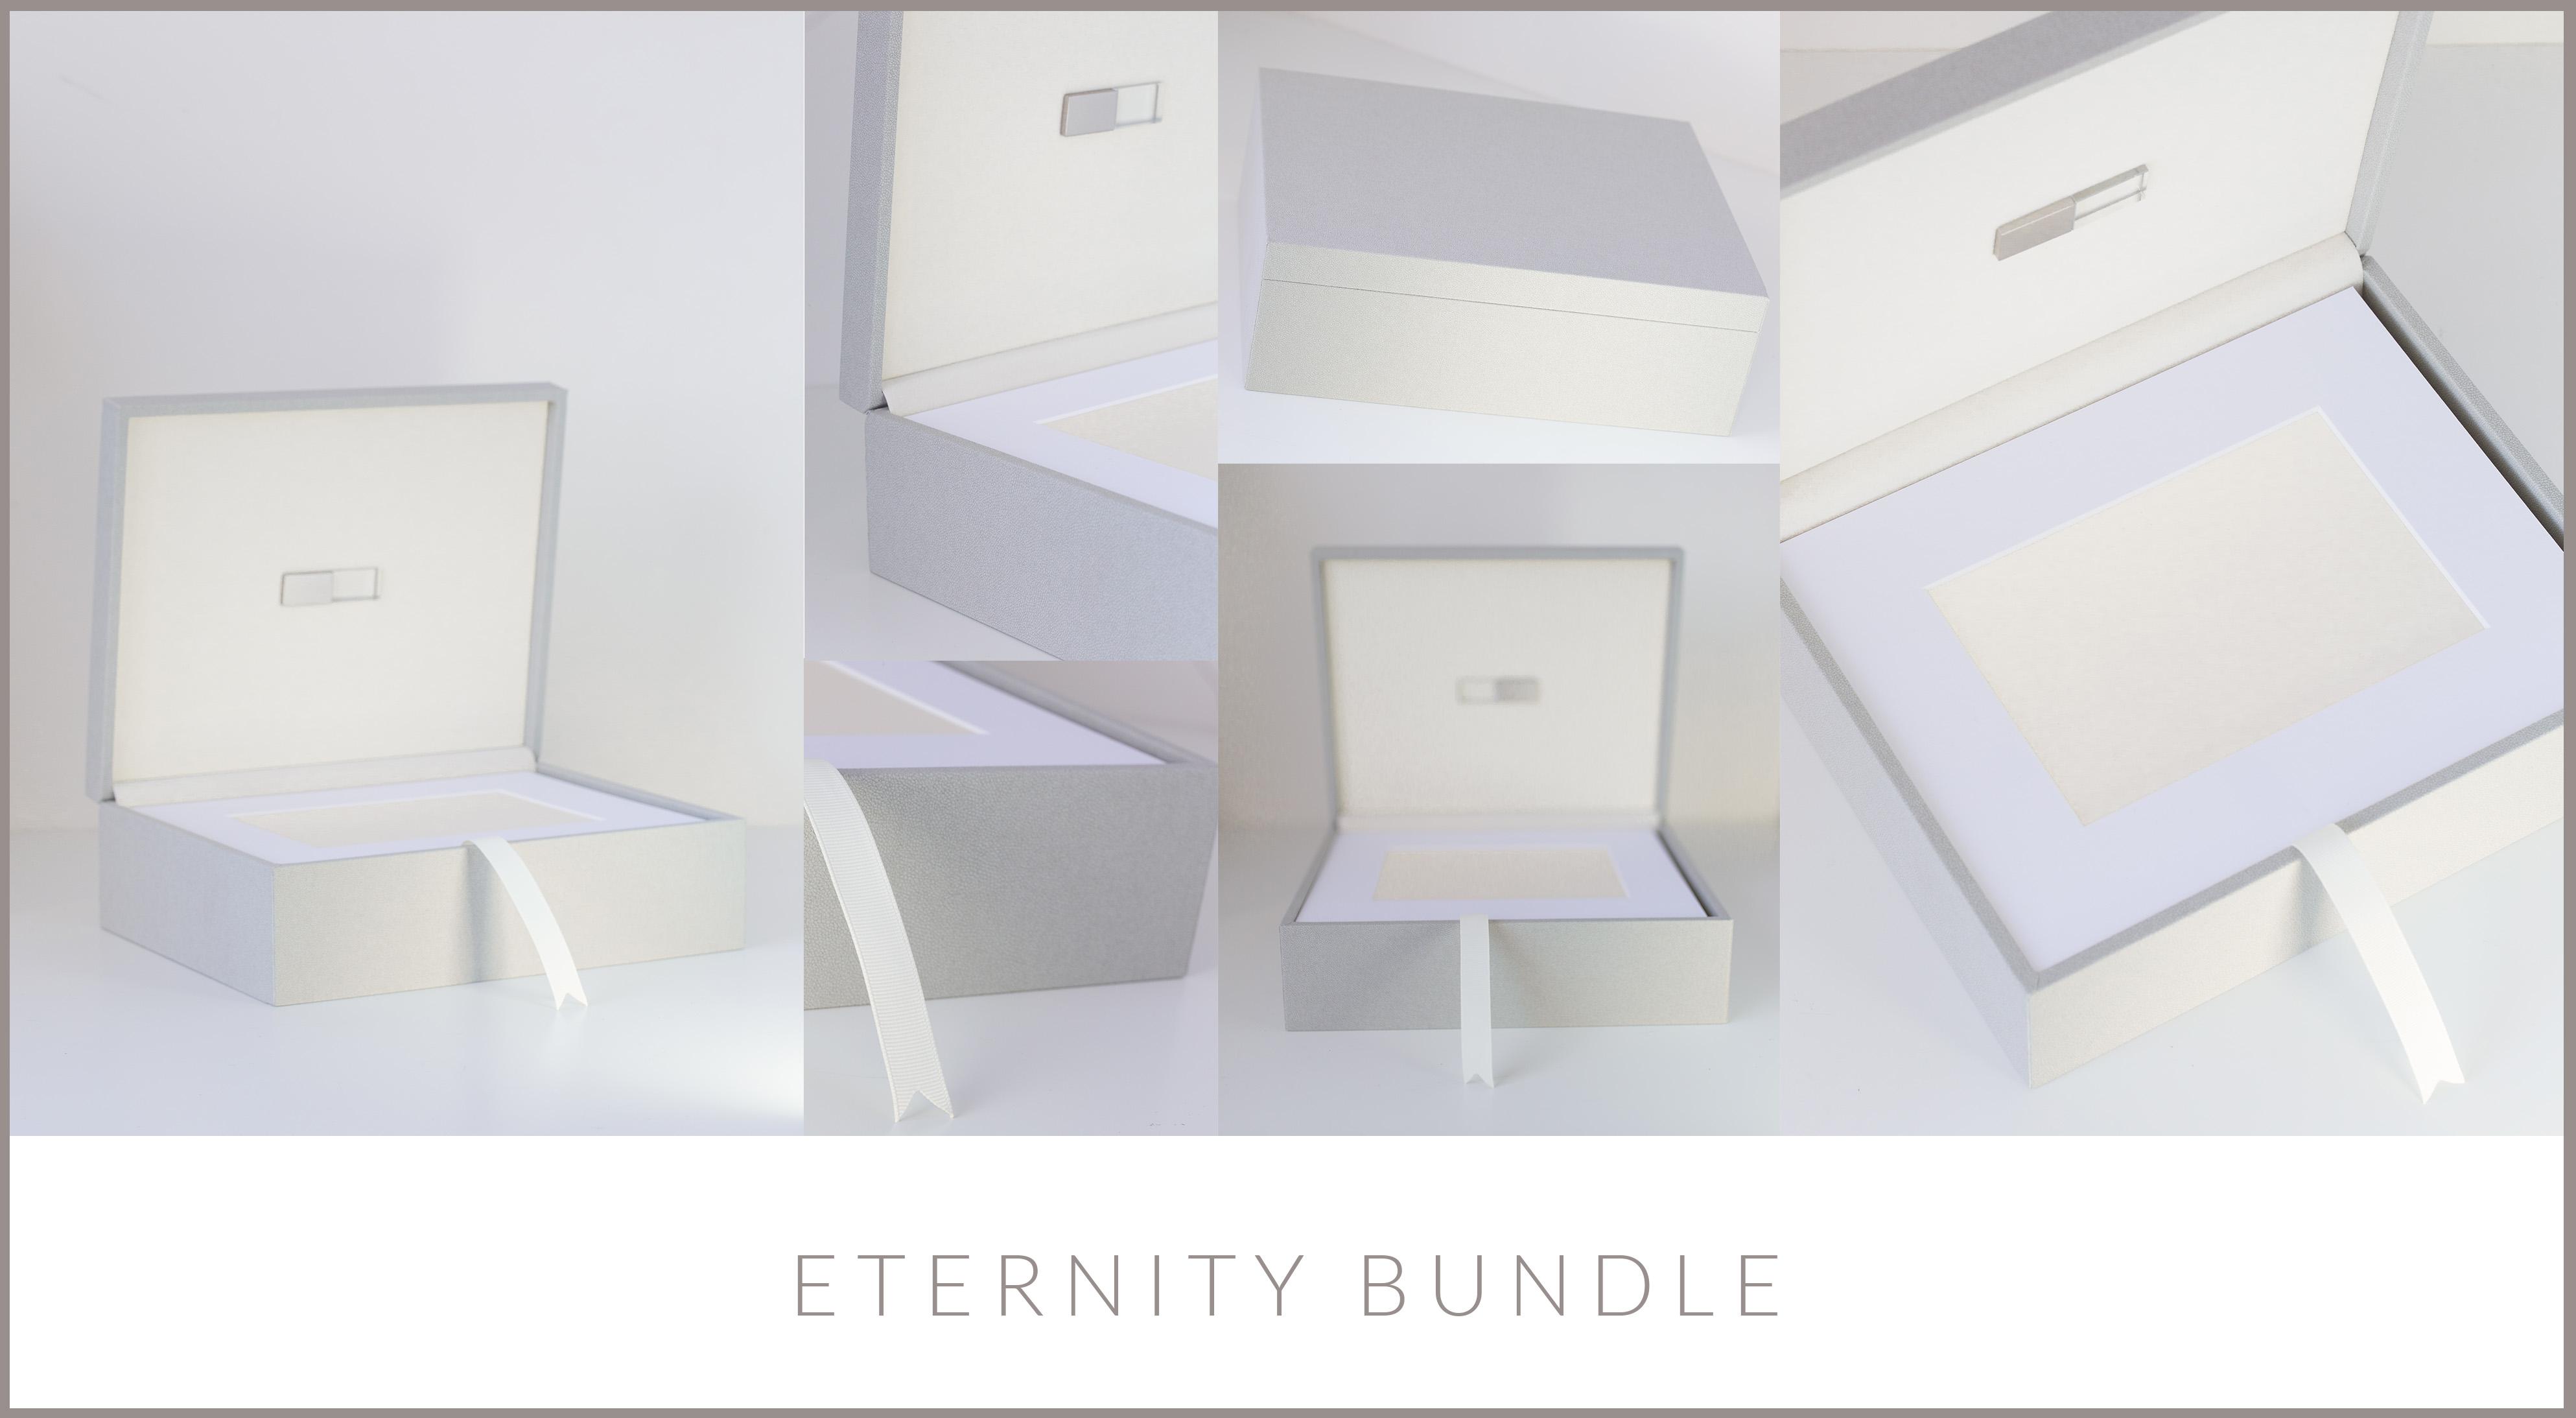 eternity bundle